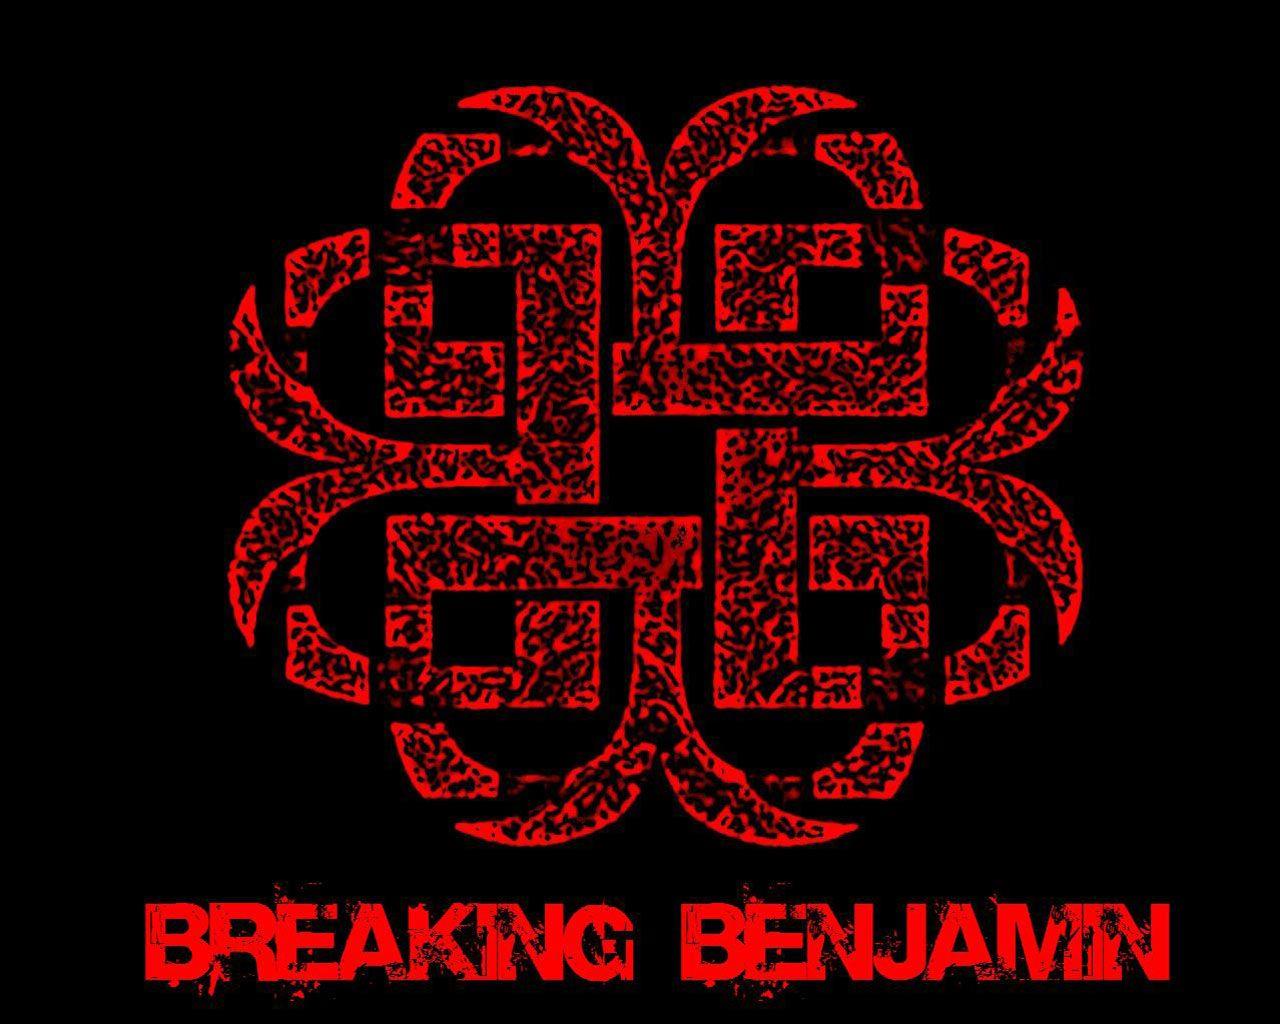 Pin By Vicky Hendrickson On Breaking Benjamin Breaking Benjamin Band Humor Power Metal